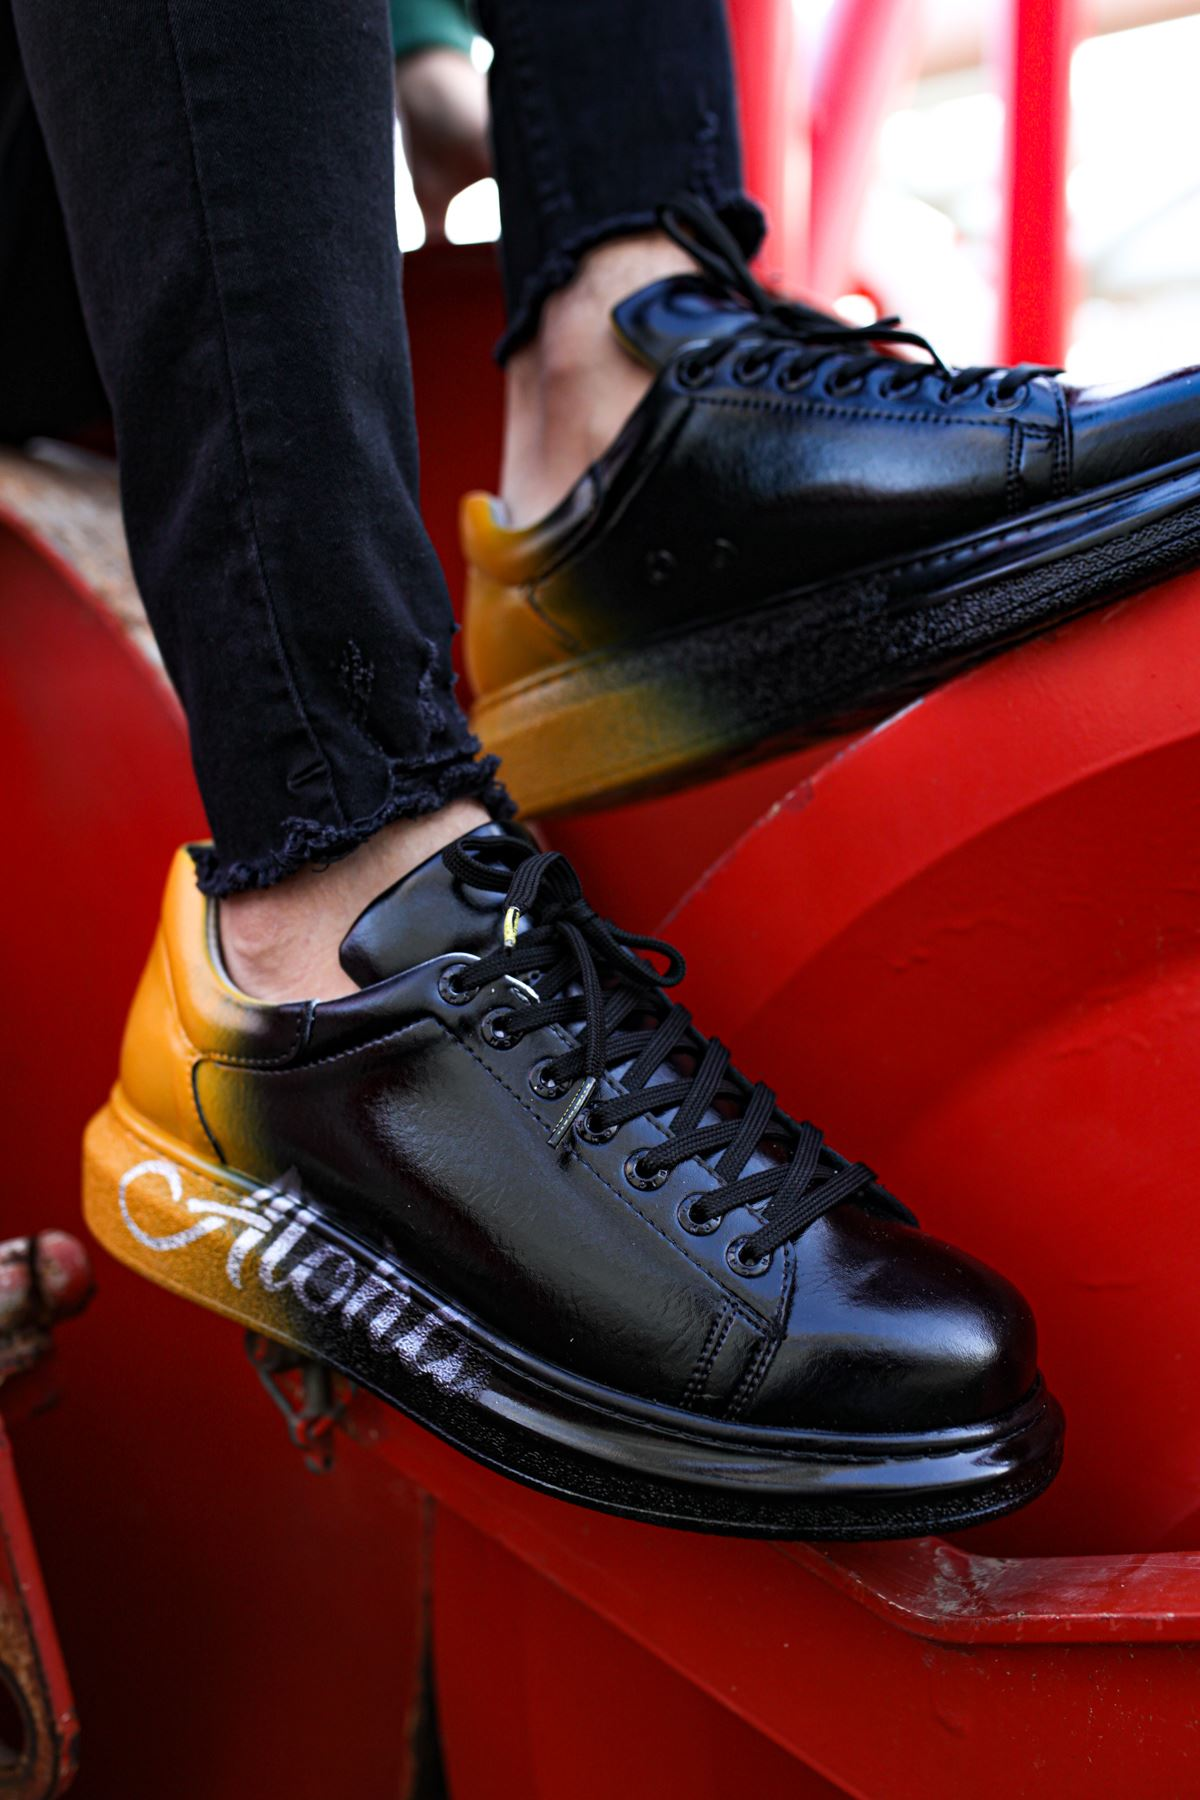 Chekich CH254 ST Erkek Ayakkabı 476 SİYAH / SARI ALOHA